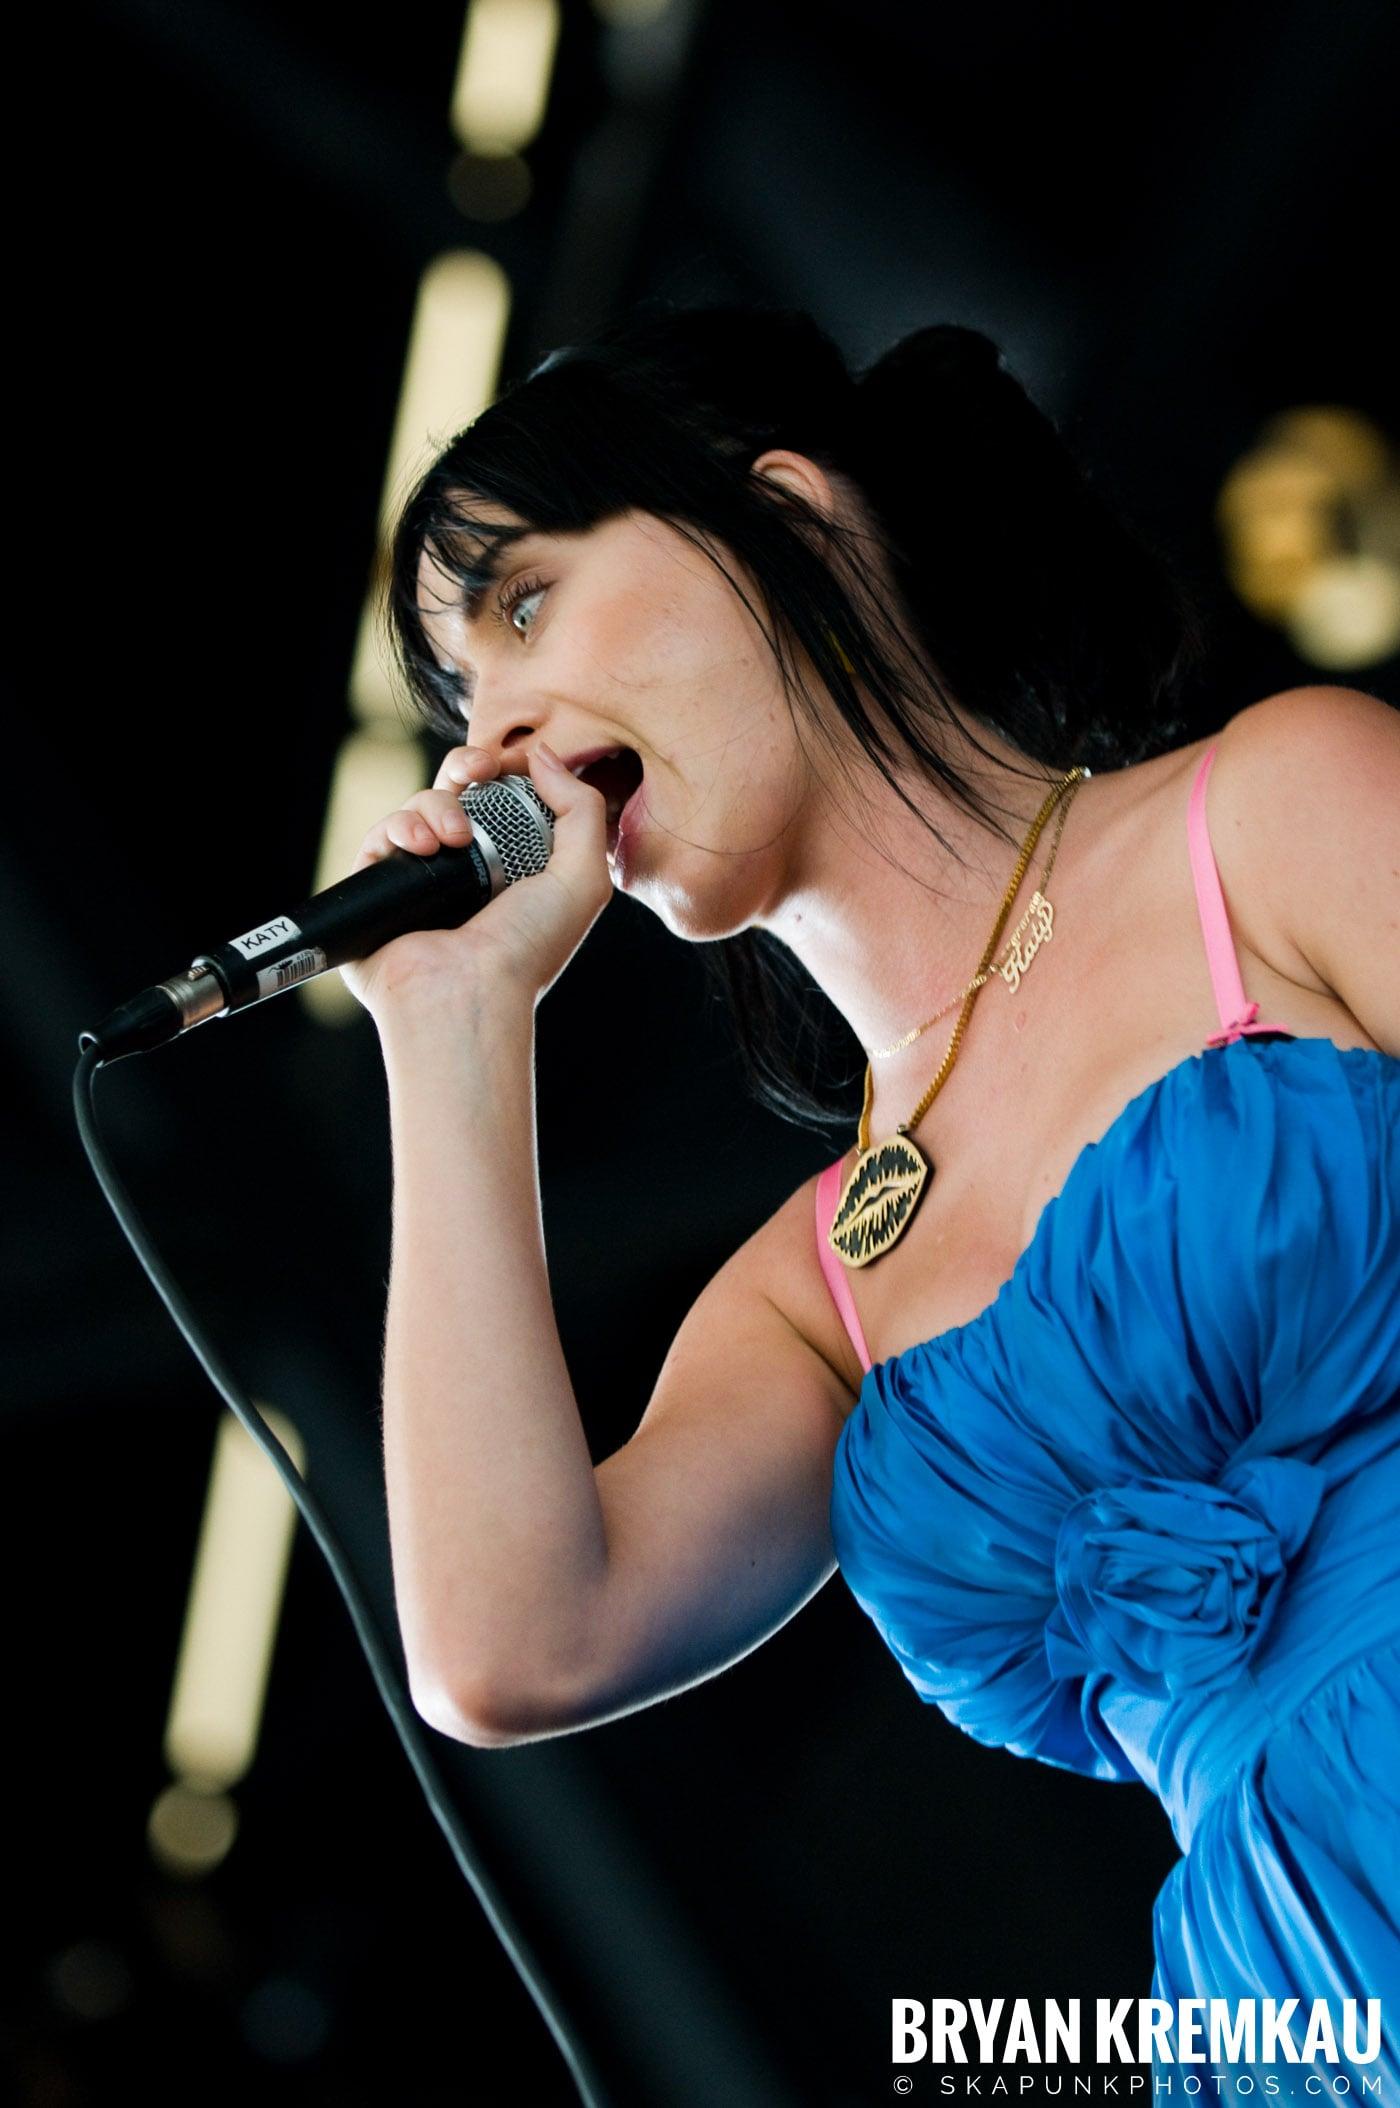 Katy Perry @ Warped Tour, Scranton PA - 7.27.08 (9)